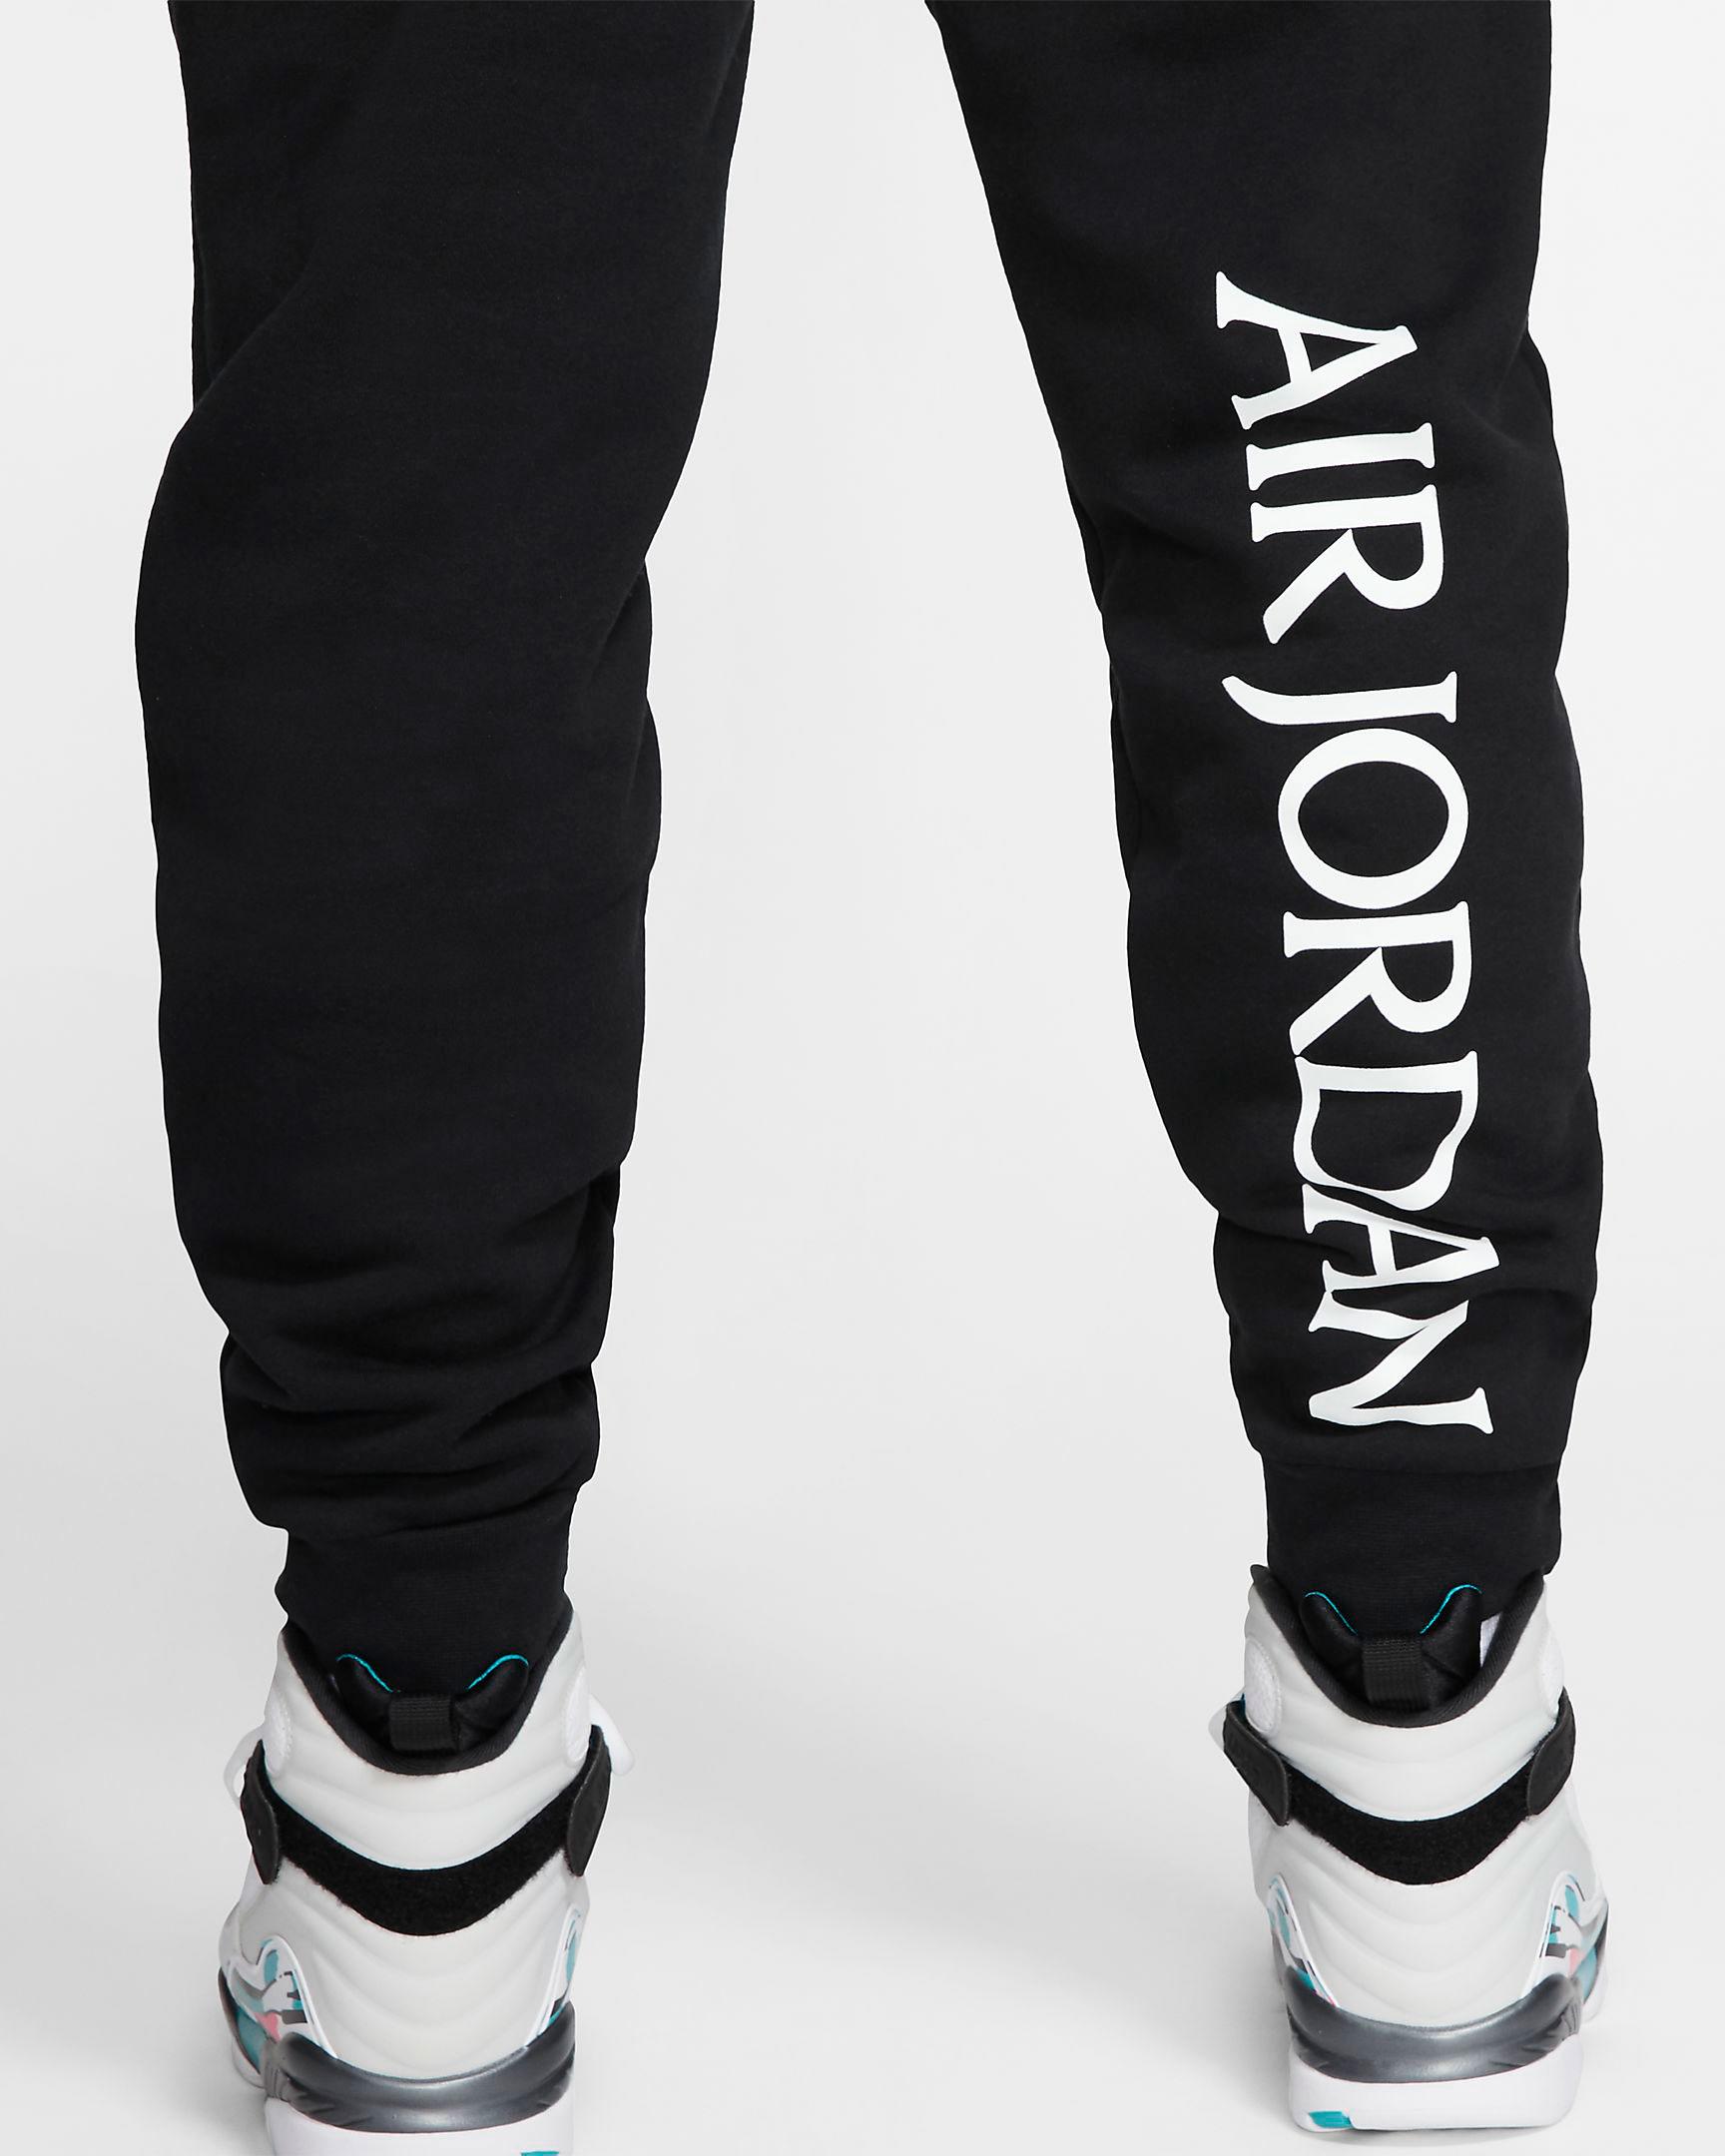 air-jordan-1-high-gym-red-black-jogger-pants-3